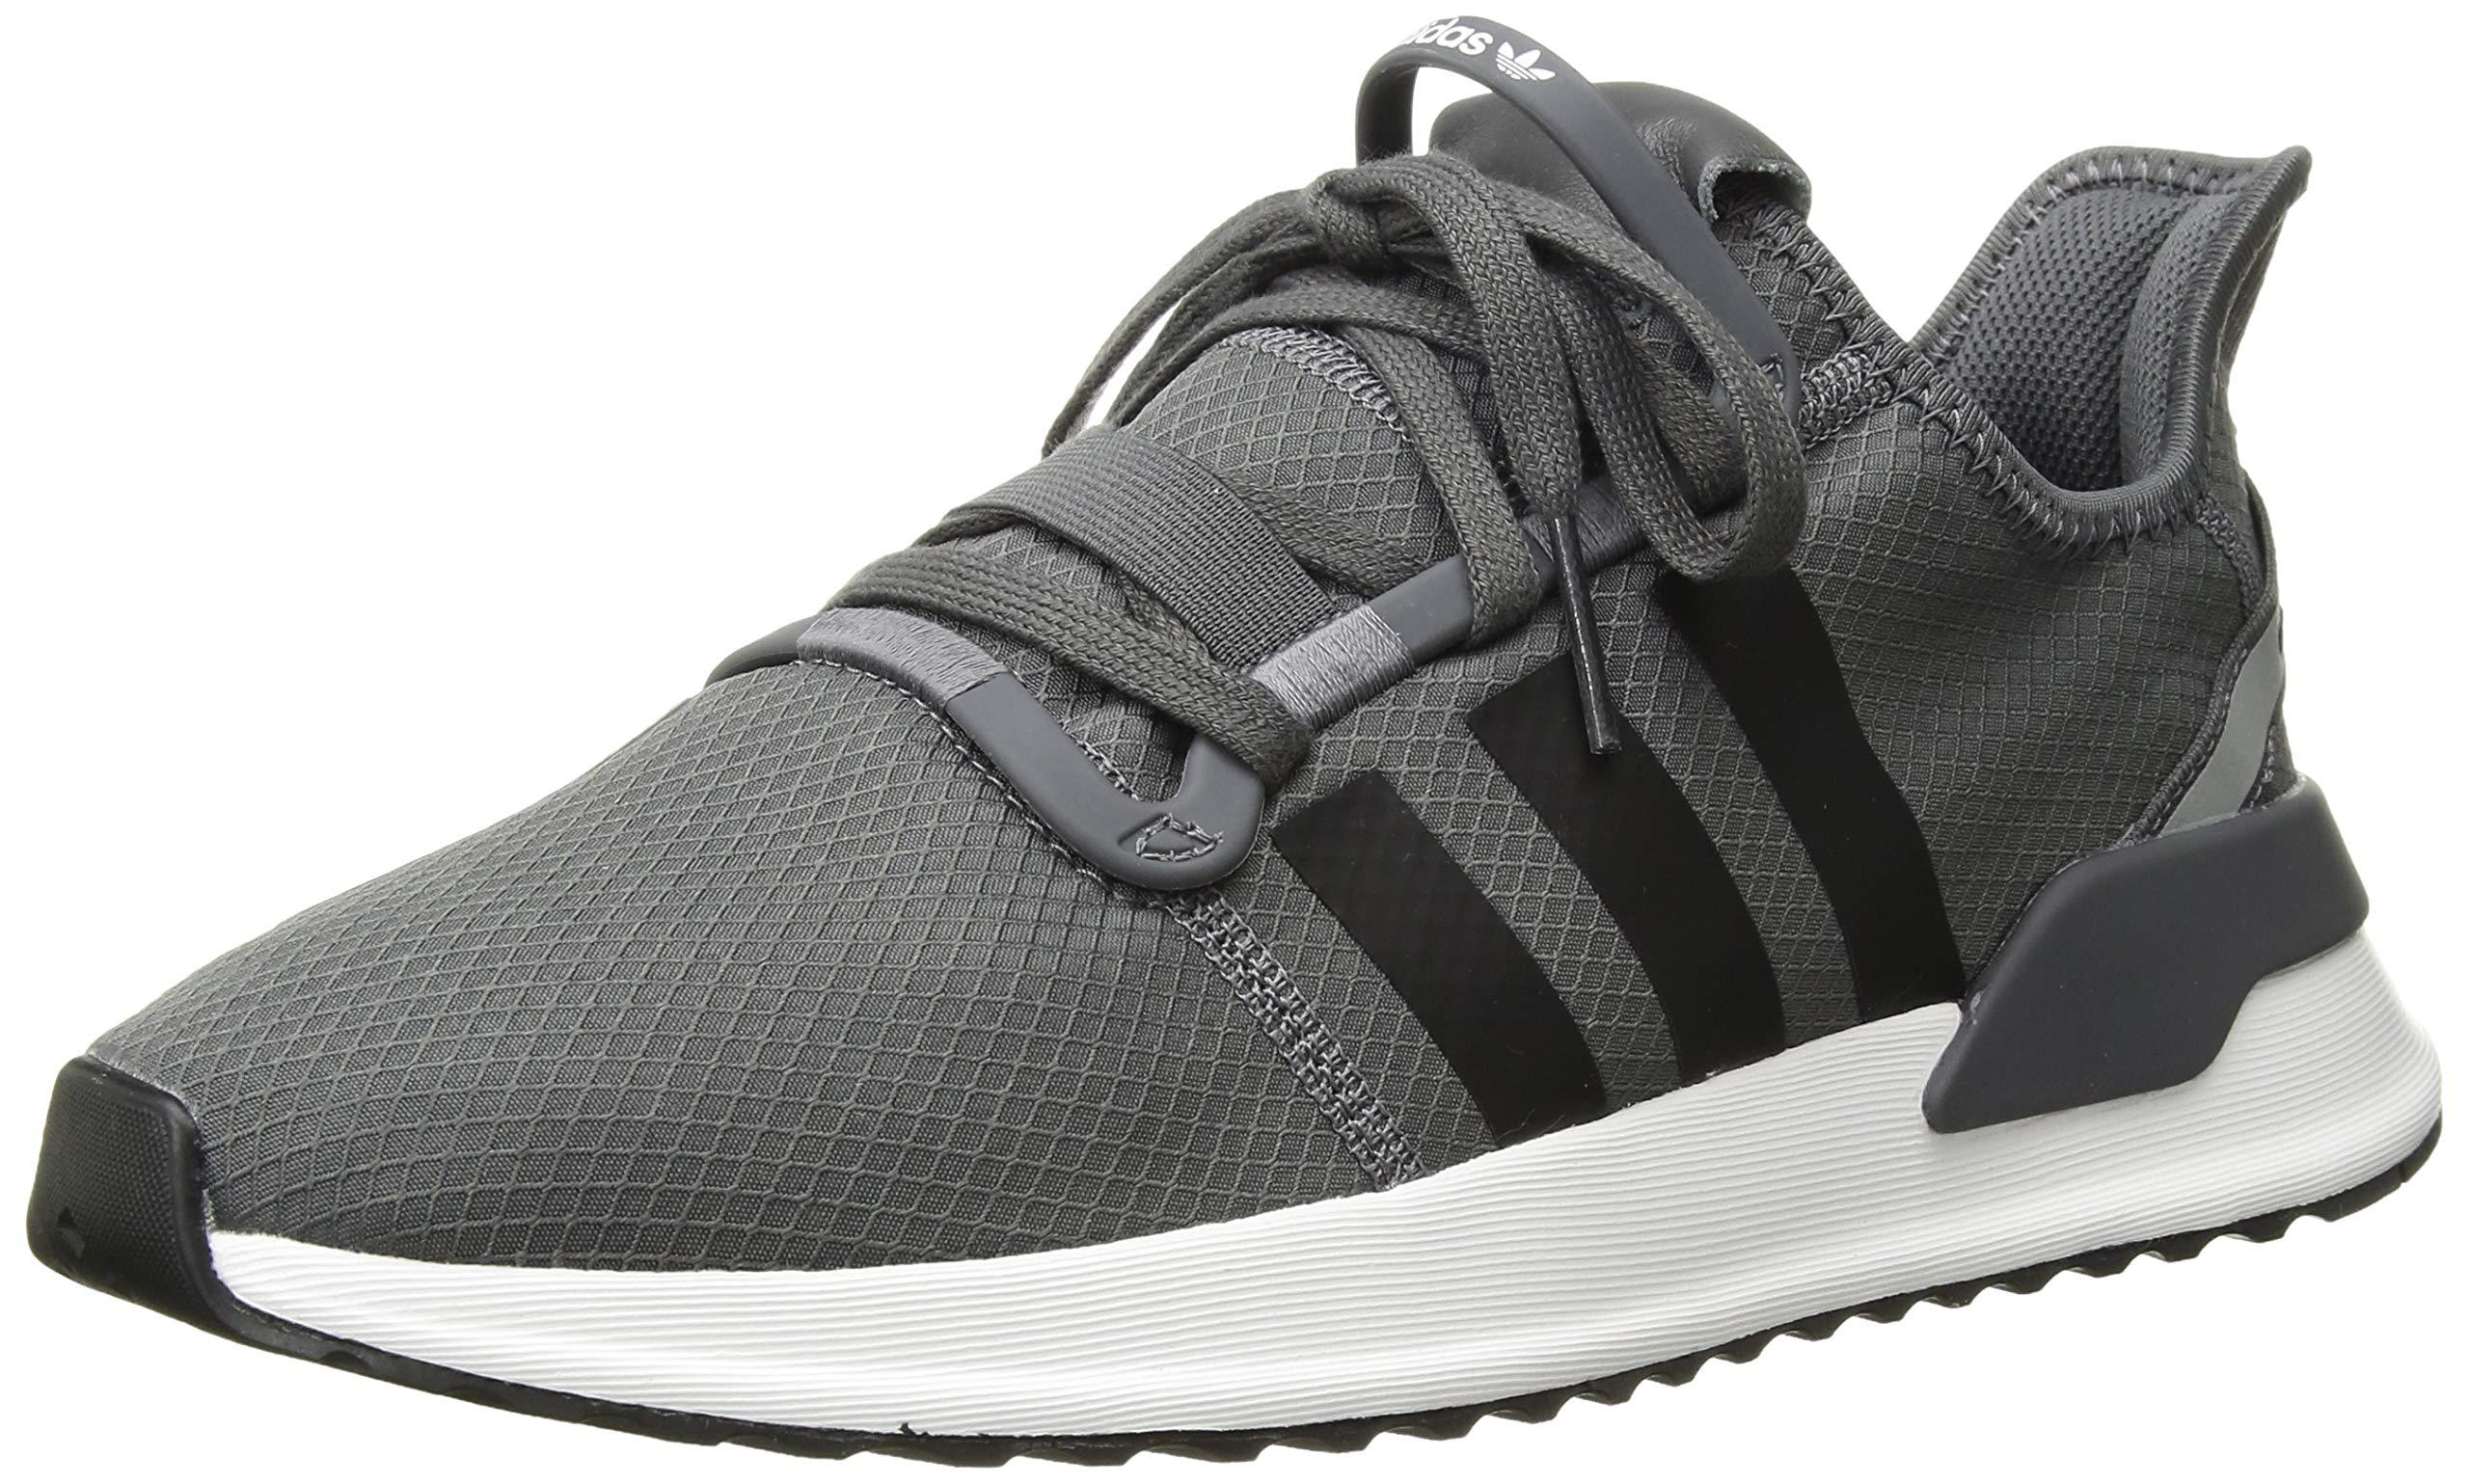 adidas Originals Men's U_Path Running Shoe, Grey/Black/White, 13.5 M US by adidas Originals